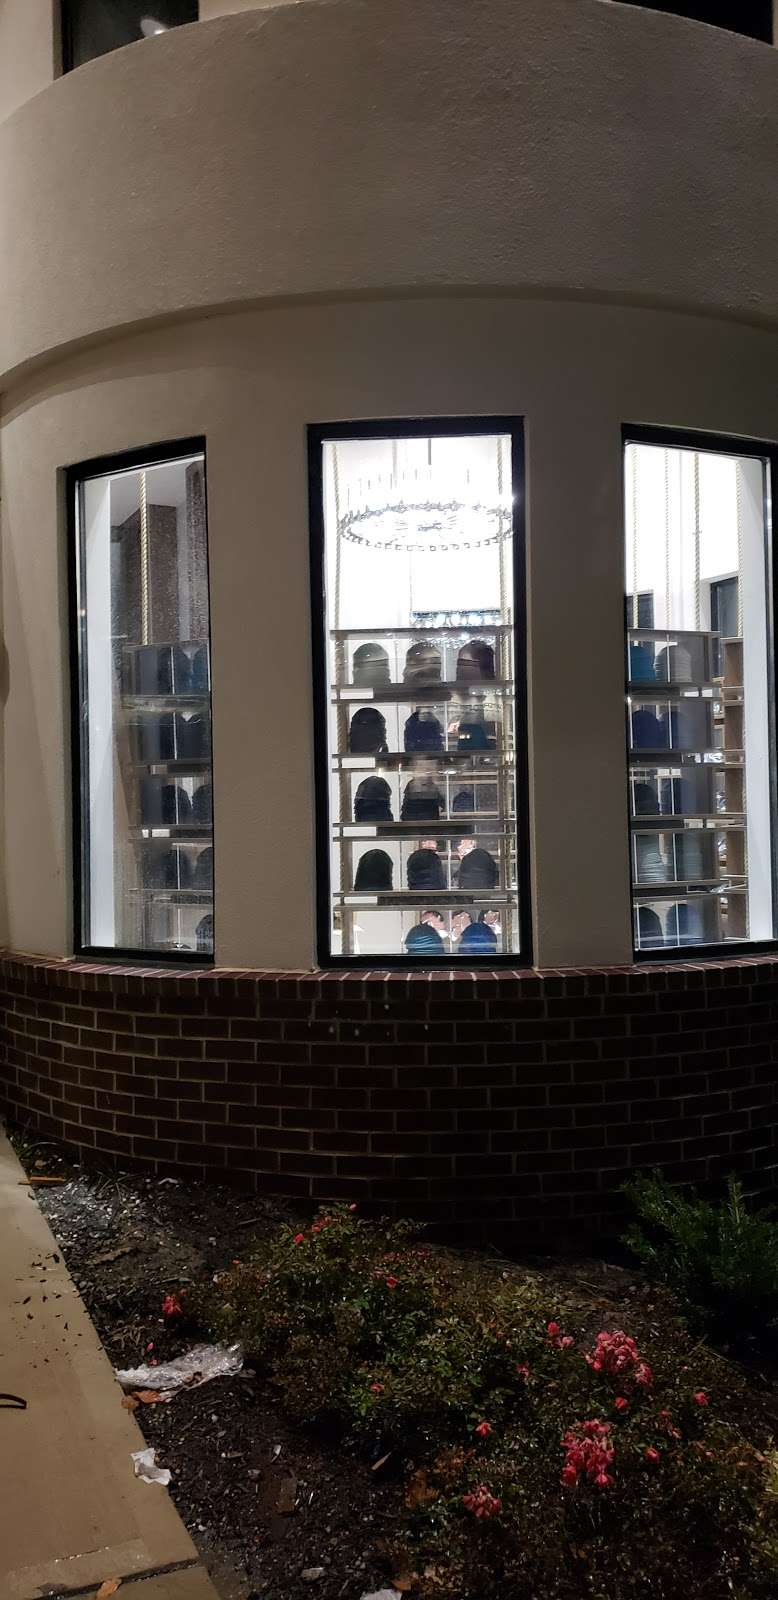 Keter Judaica Lakewood - store    Photo 3 of 3   Address: 12 America Ave, Lakewood, NJ 08701, USA   Phone: (732) 678-9250